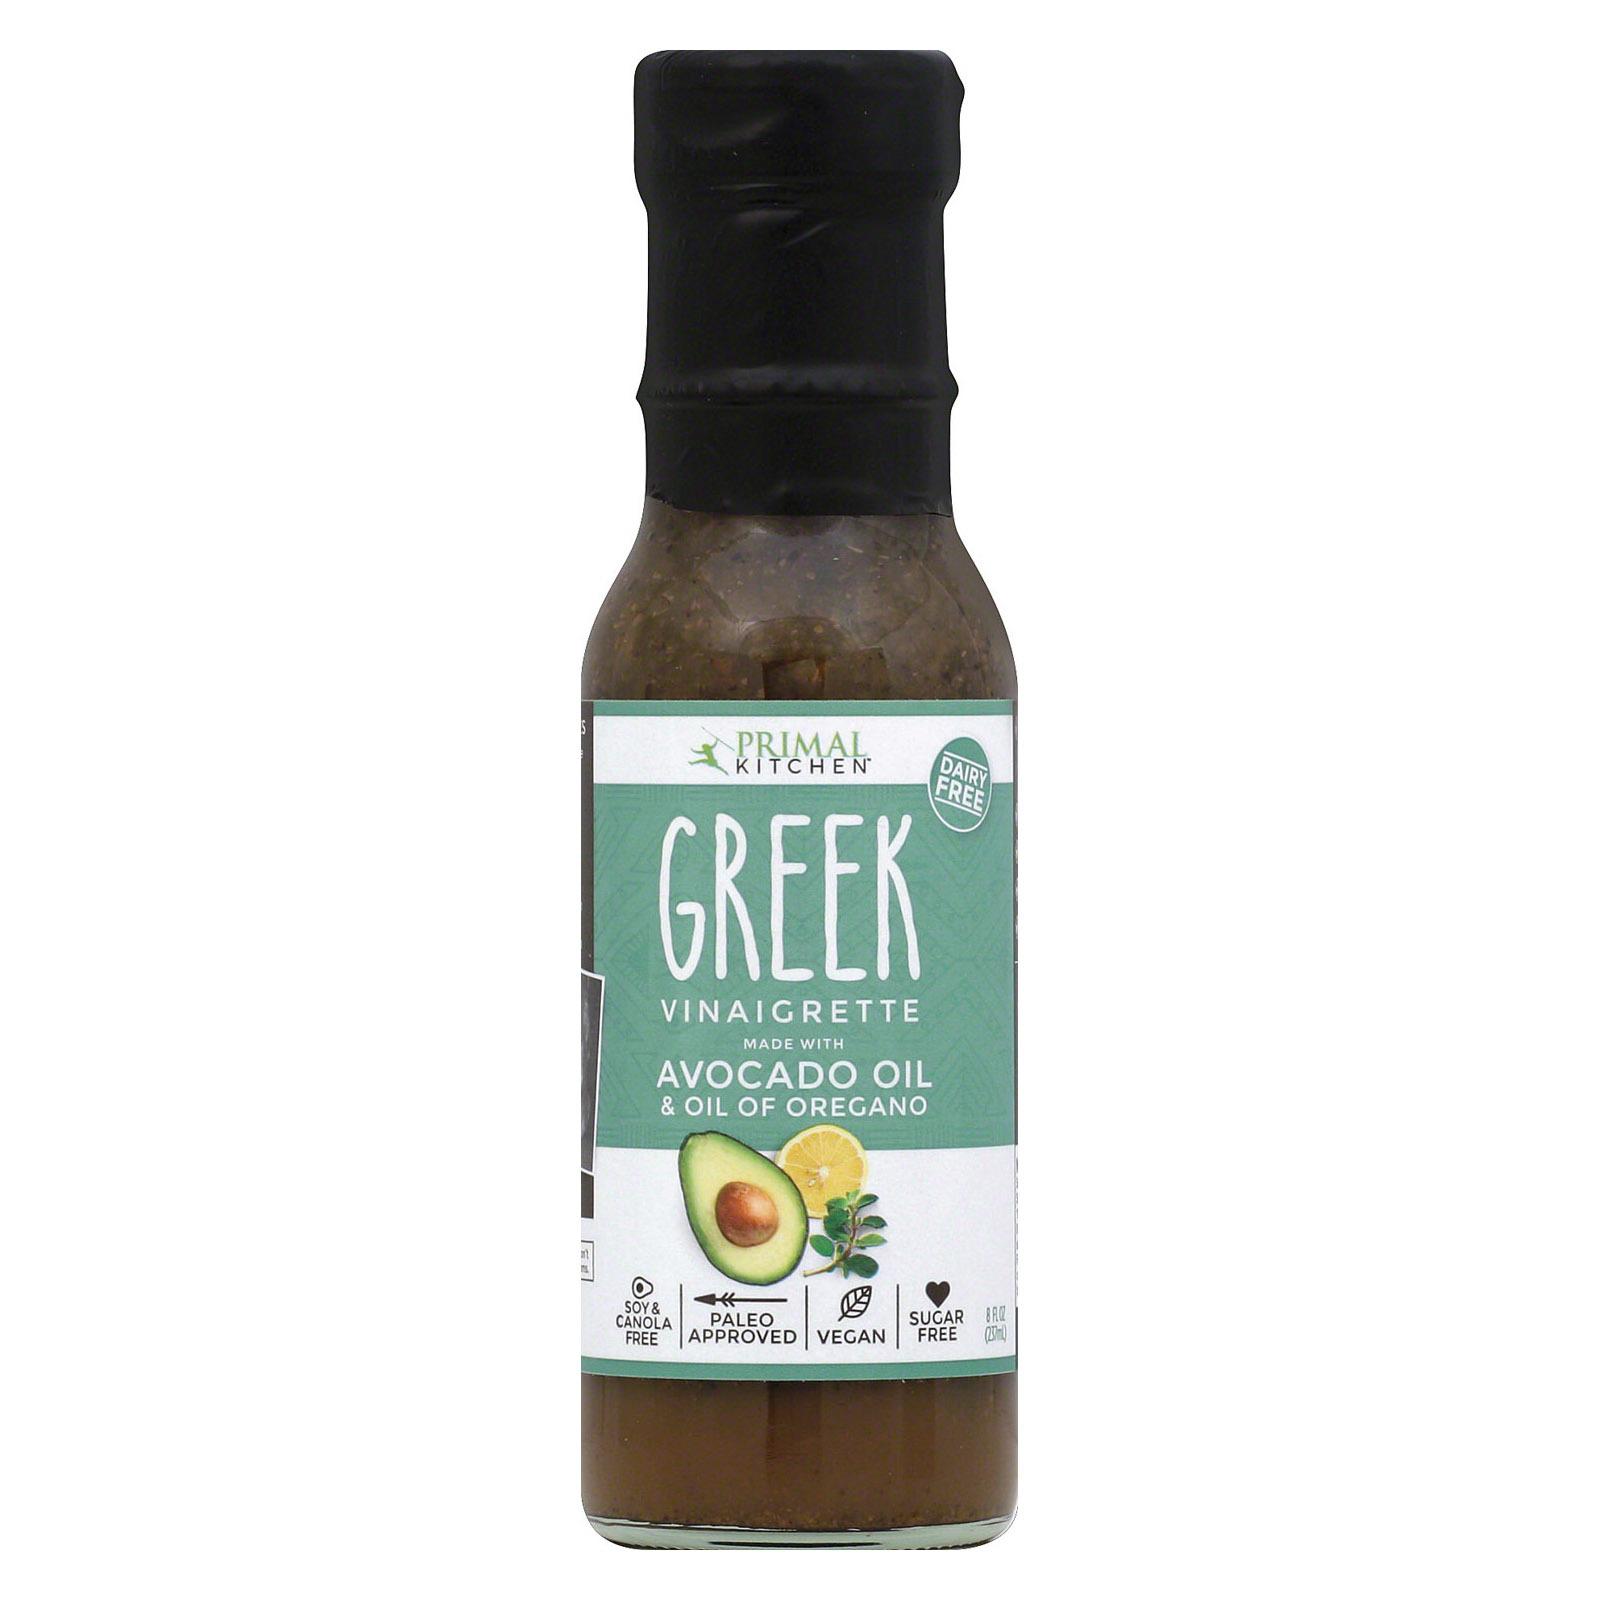 Primal Kitchen Greek Vinaigrette - Avocado Oil and Organic Oil - Case of 6 - 8 oz.